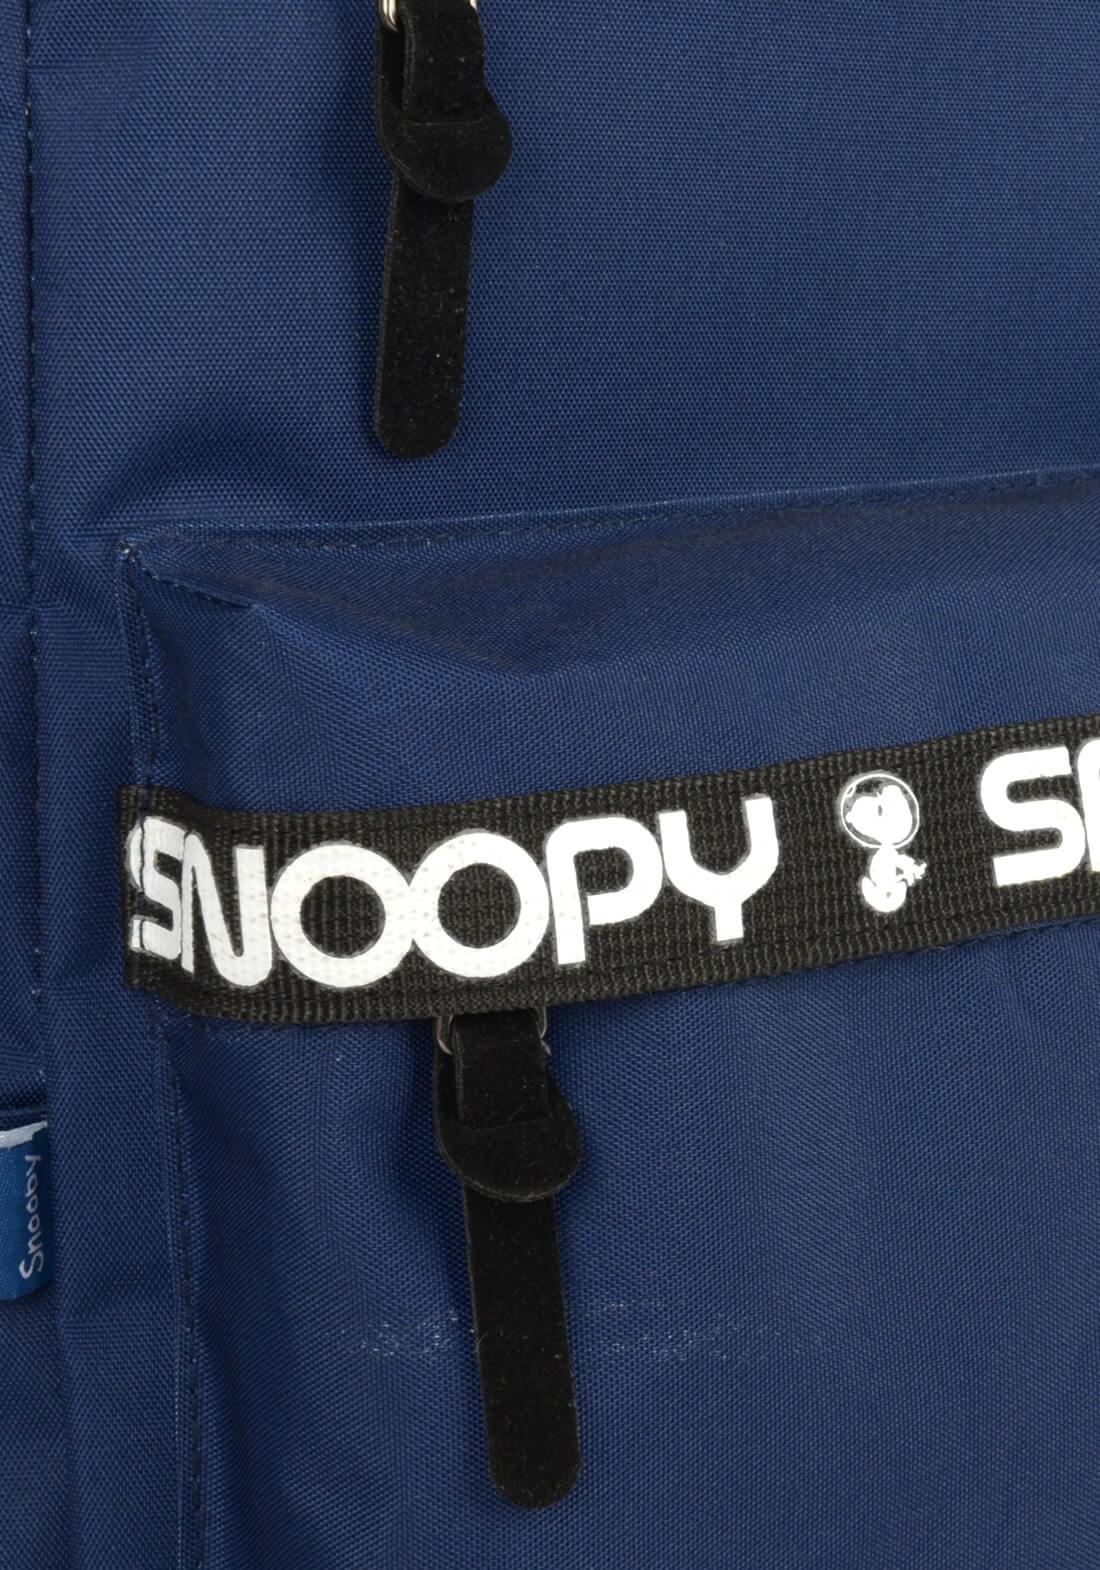 Mochila Peanuts Snoopy Notebook Costas Azul Original Garanti